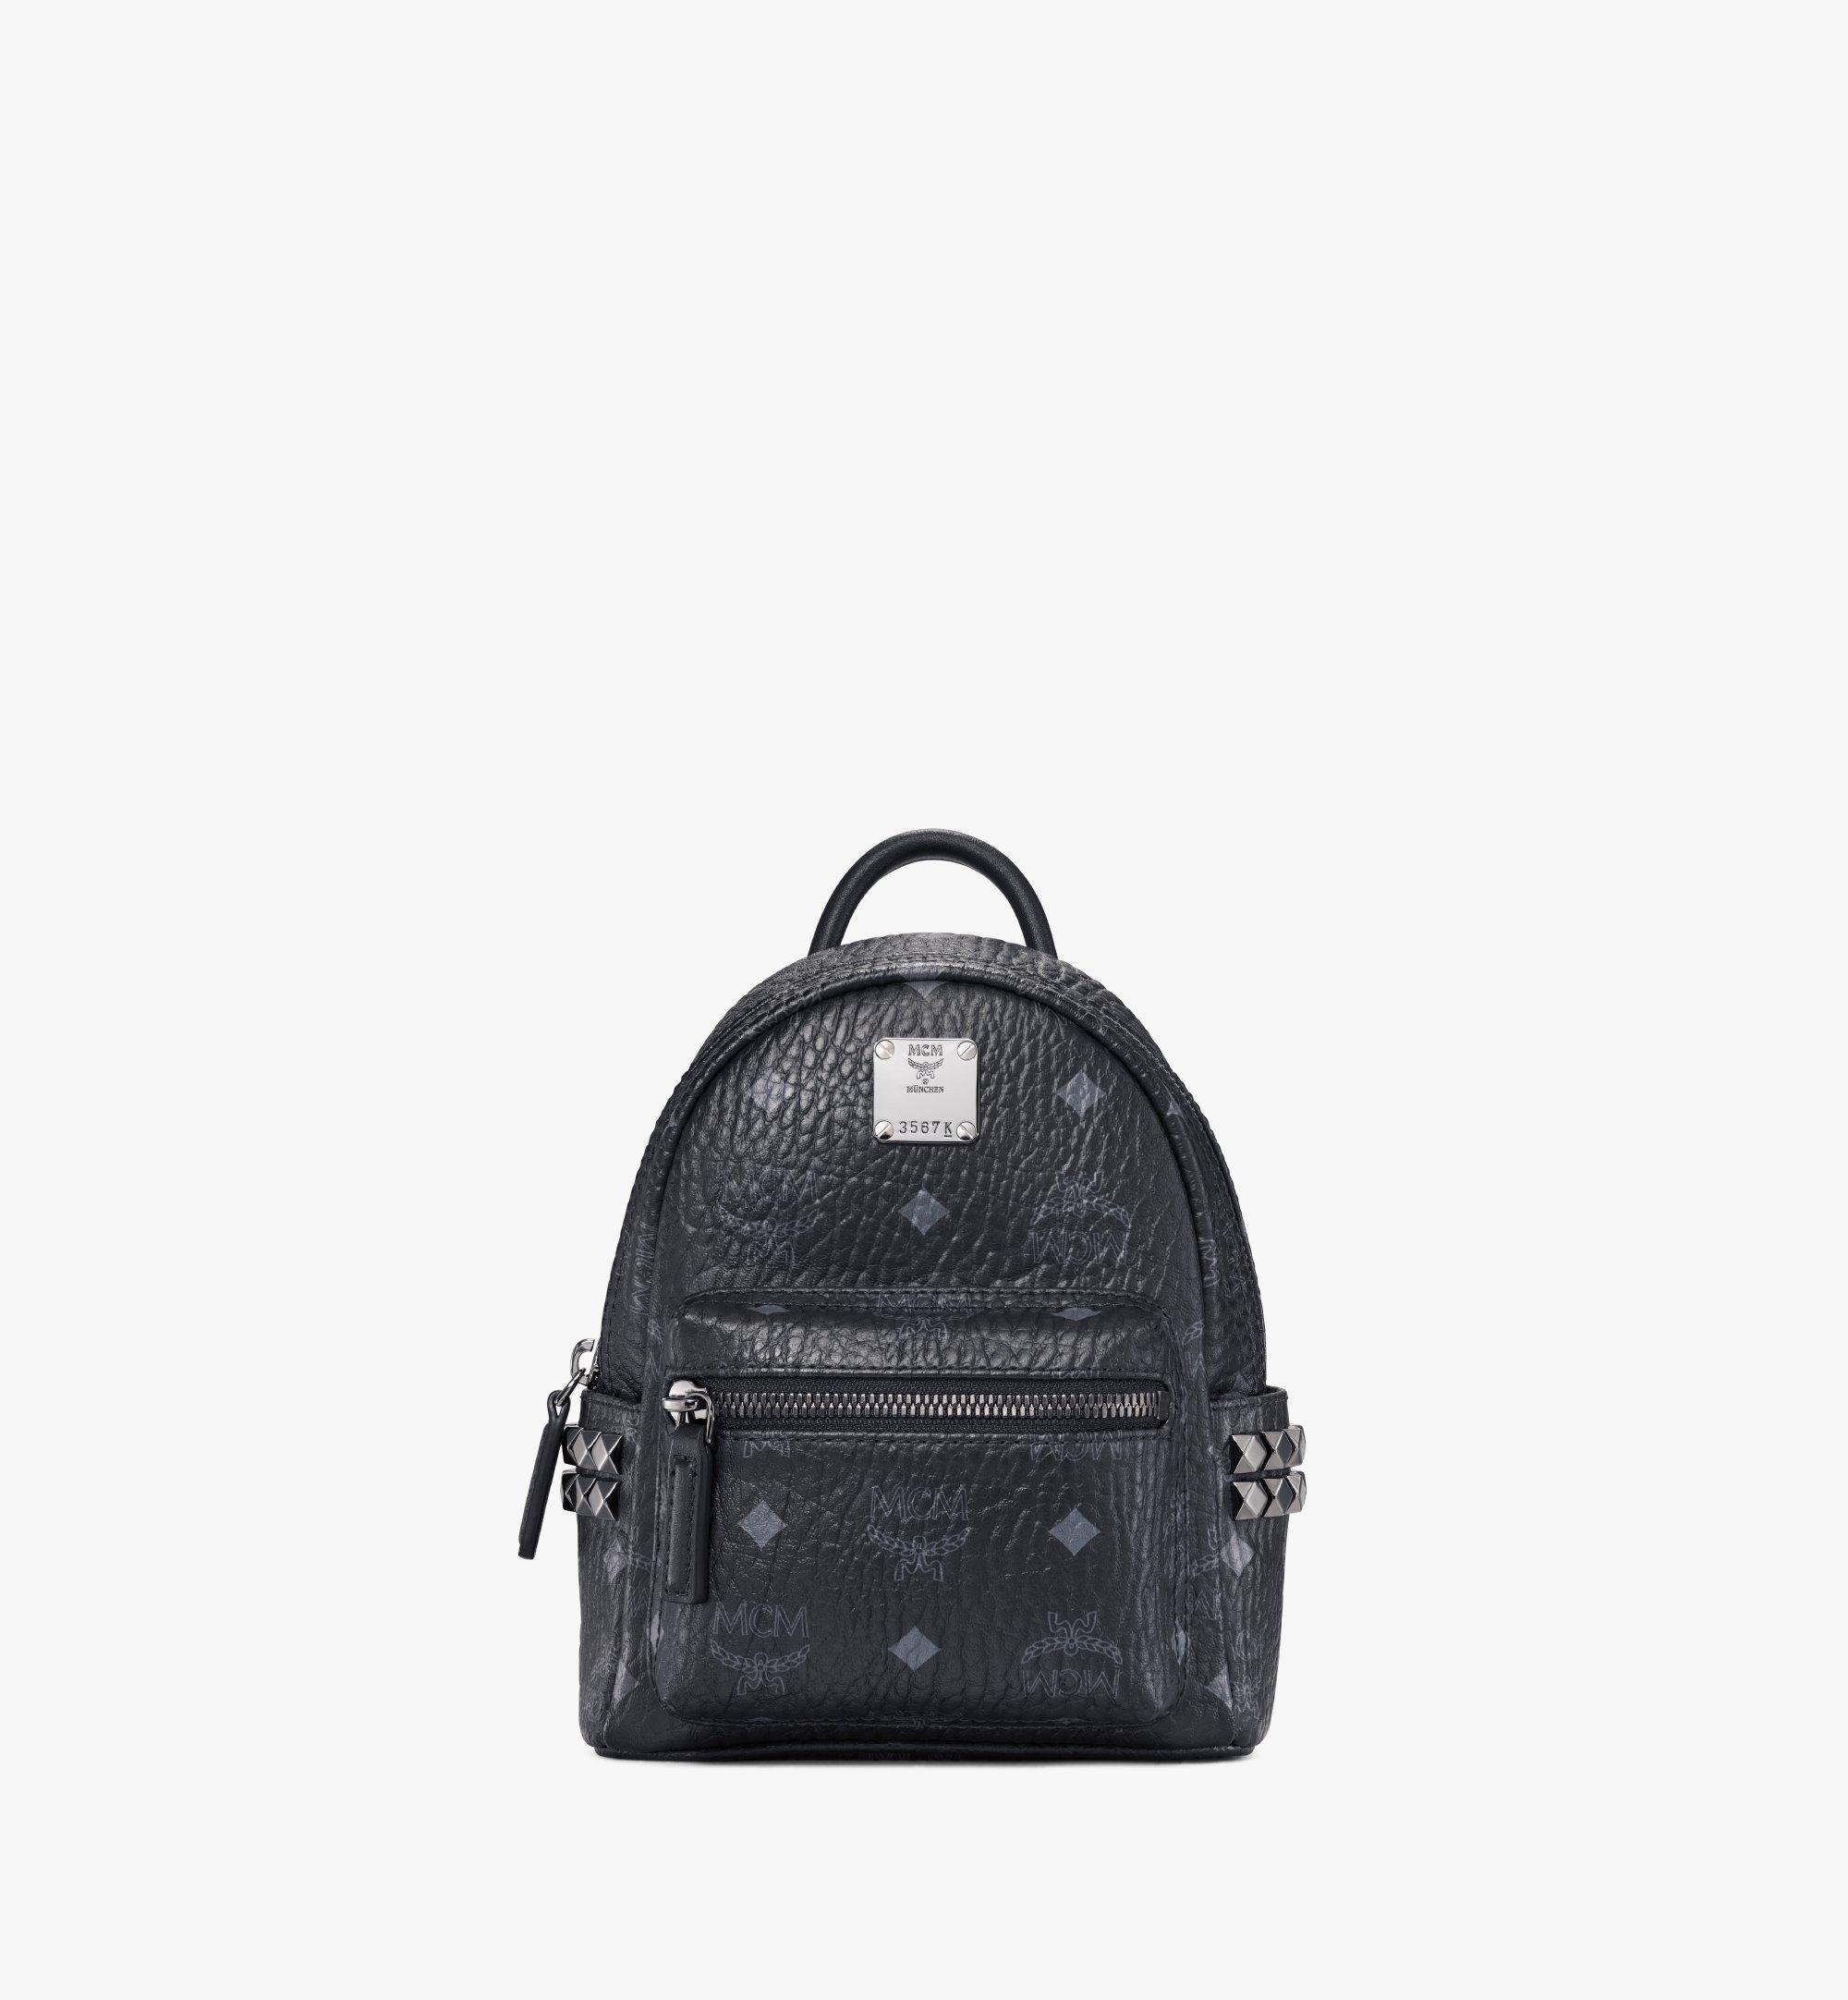 MCM Stark Bebe Boo Backpack in Visetos Black MMK6SVE92BK001 Alternate View 1